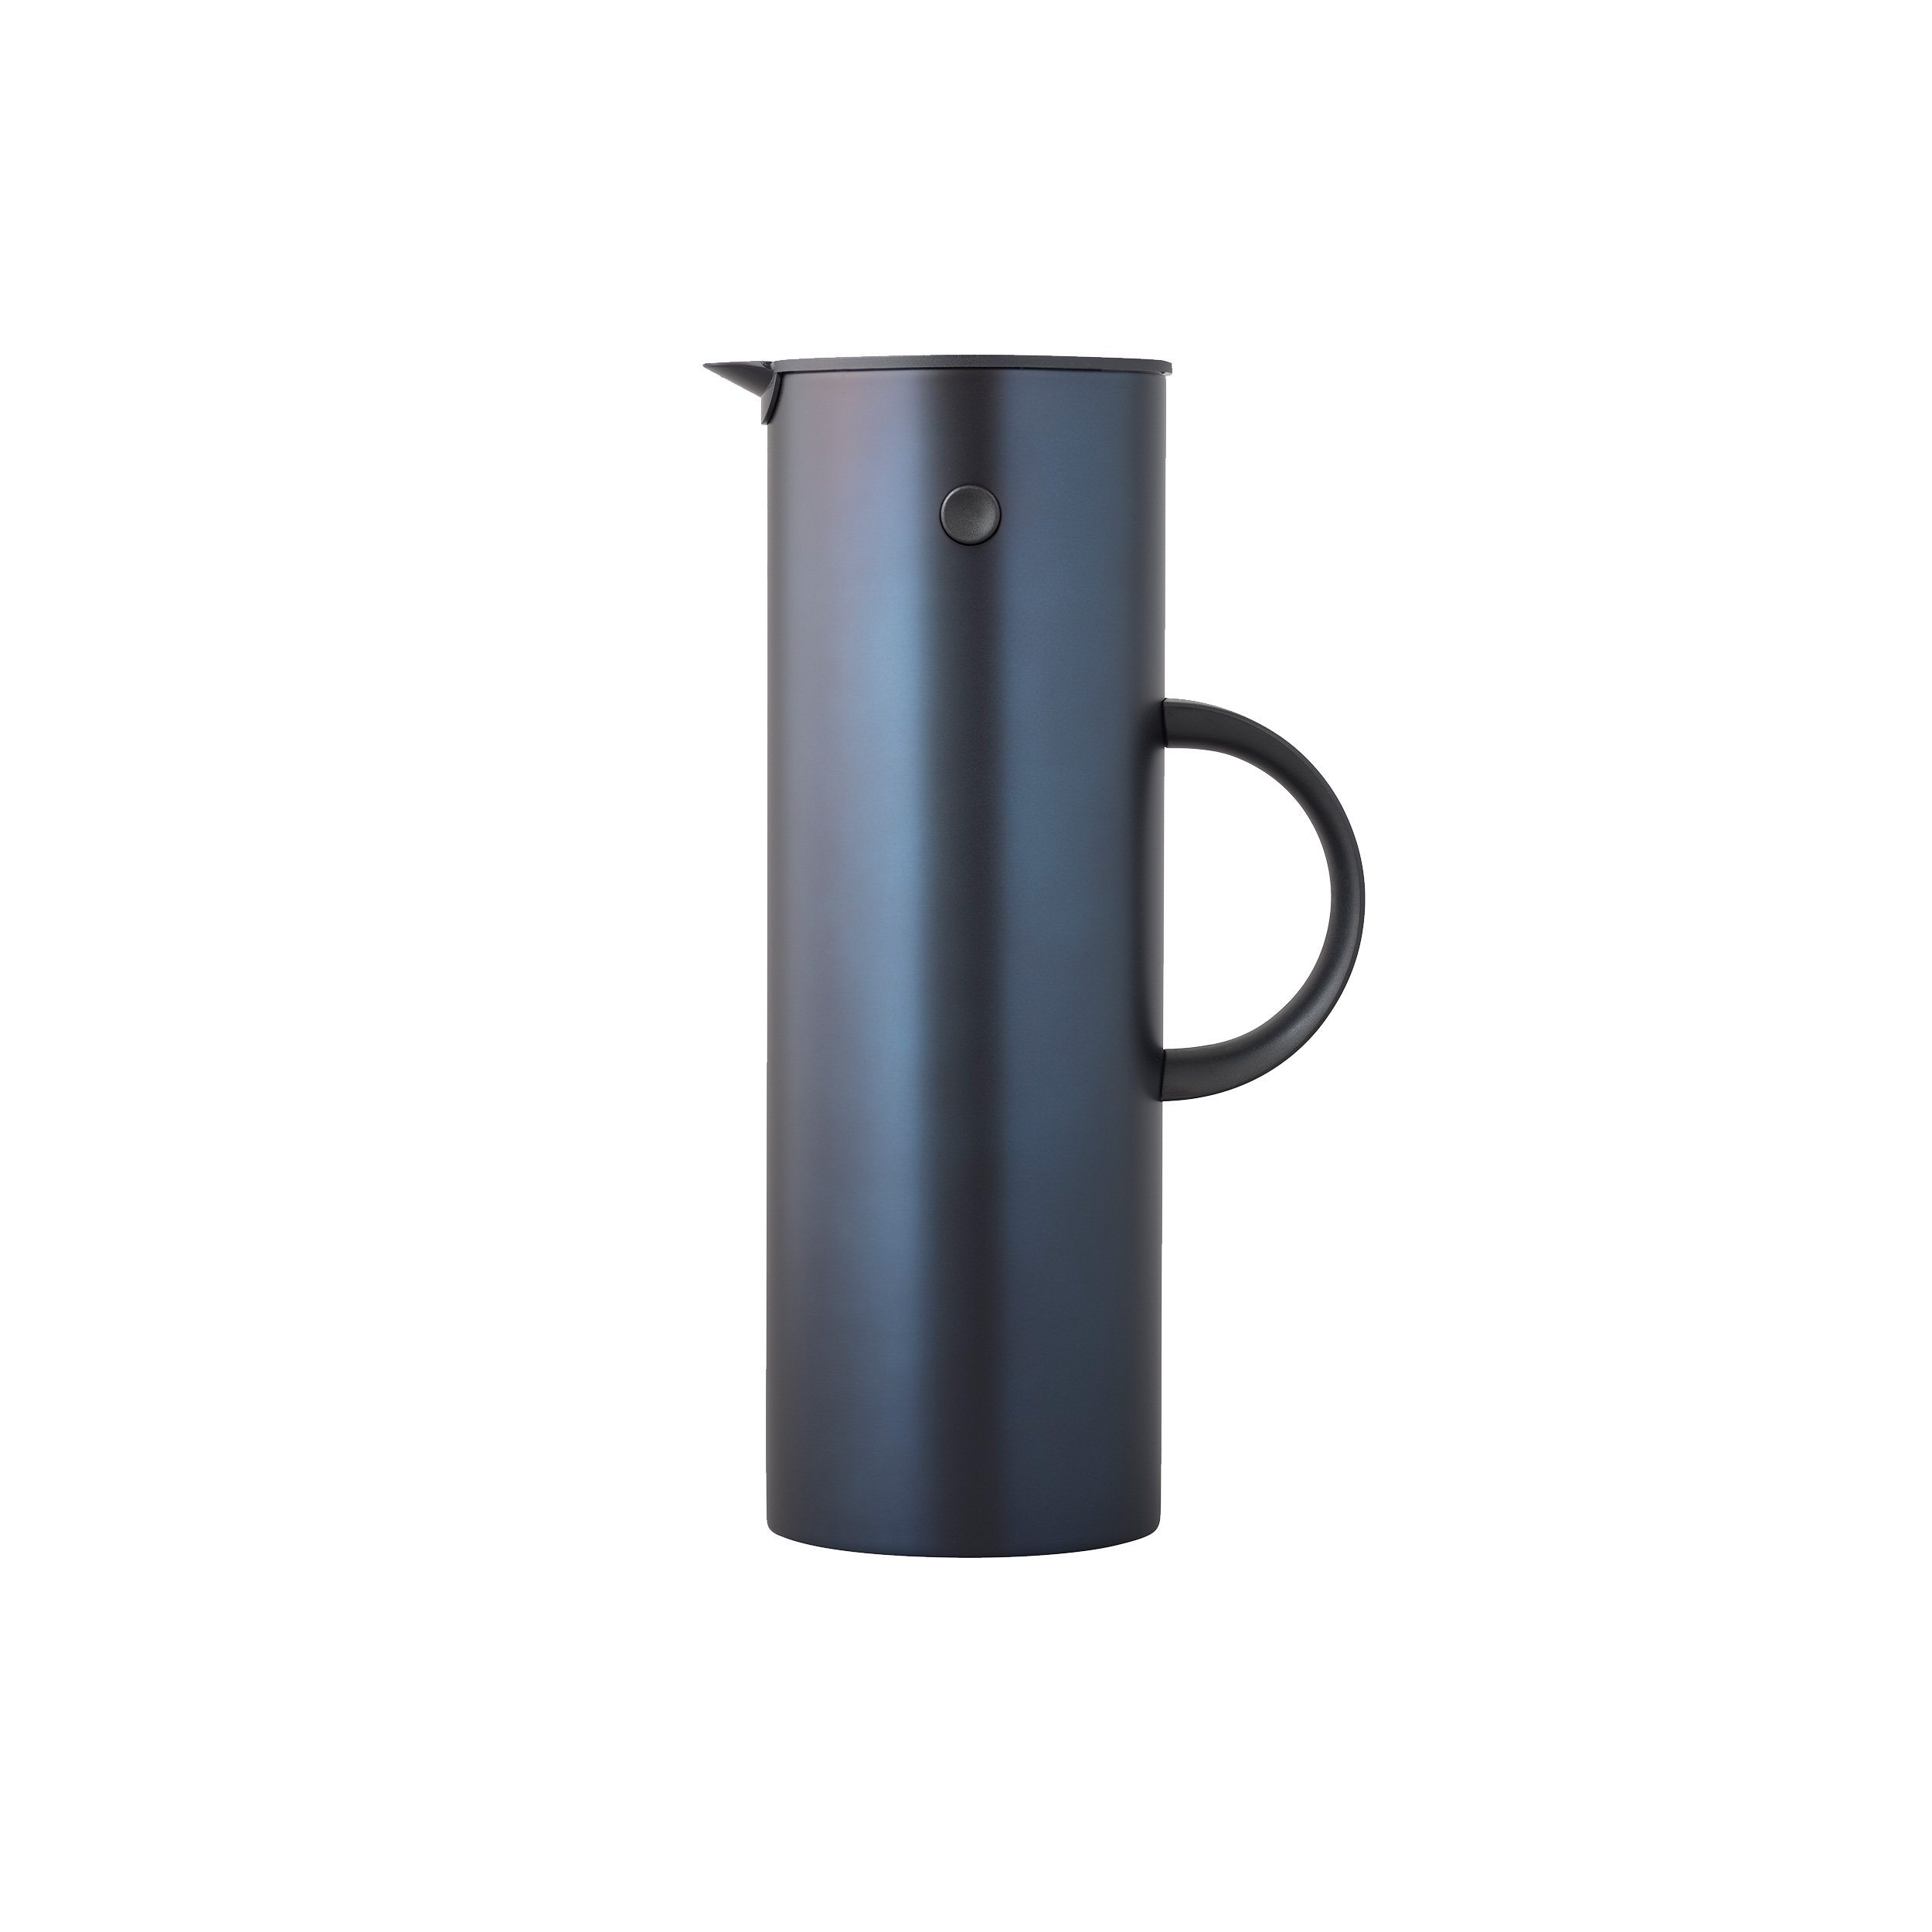 Stelton 'EM77 Vacuum Jug 40 Year Edition, Dark Blue Metallic